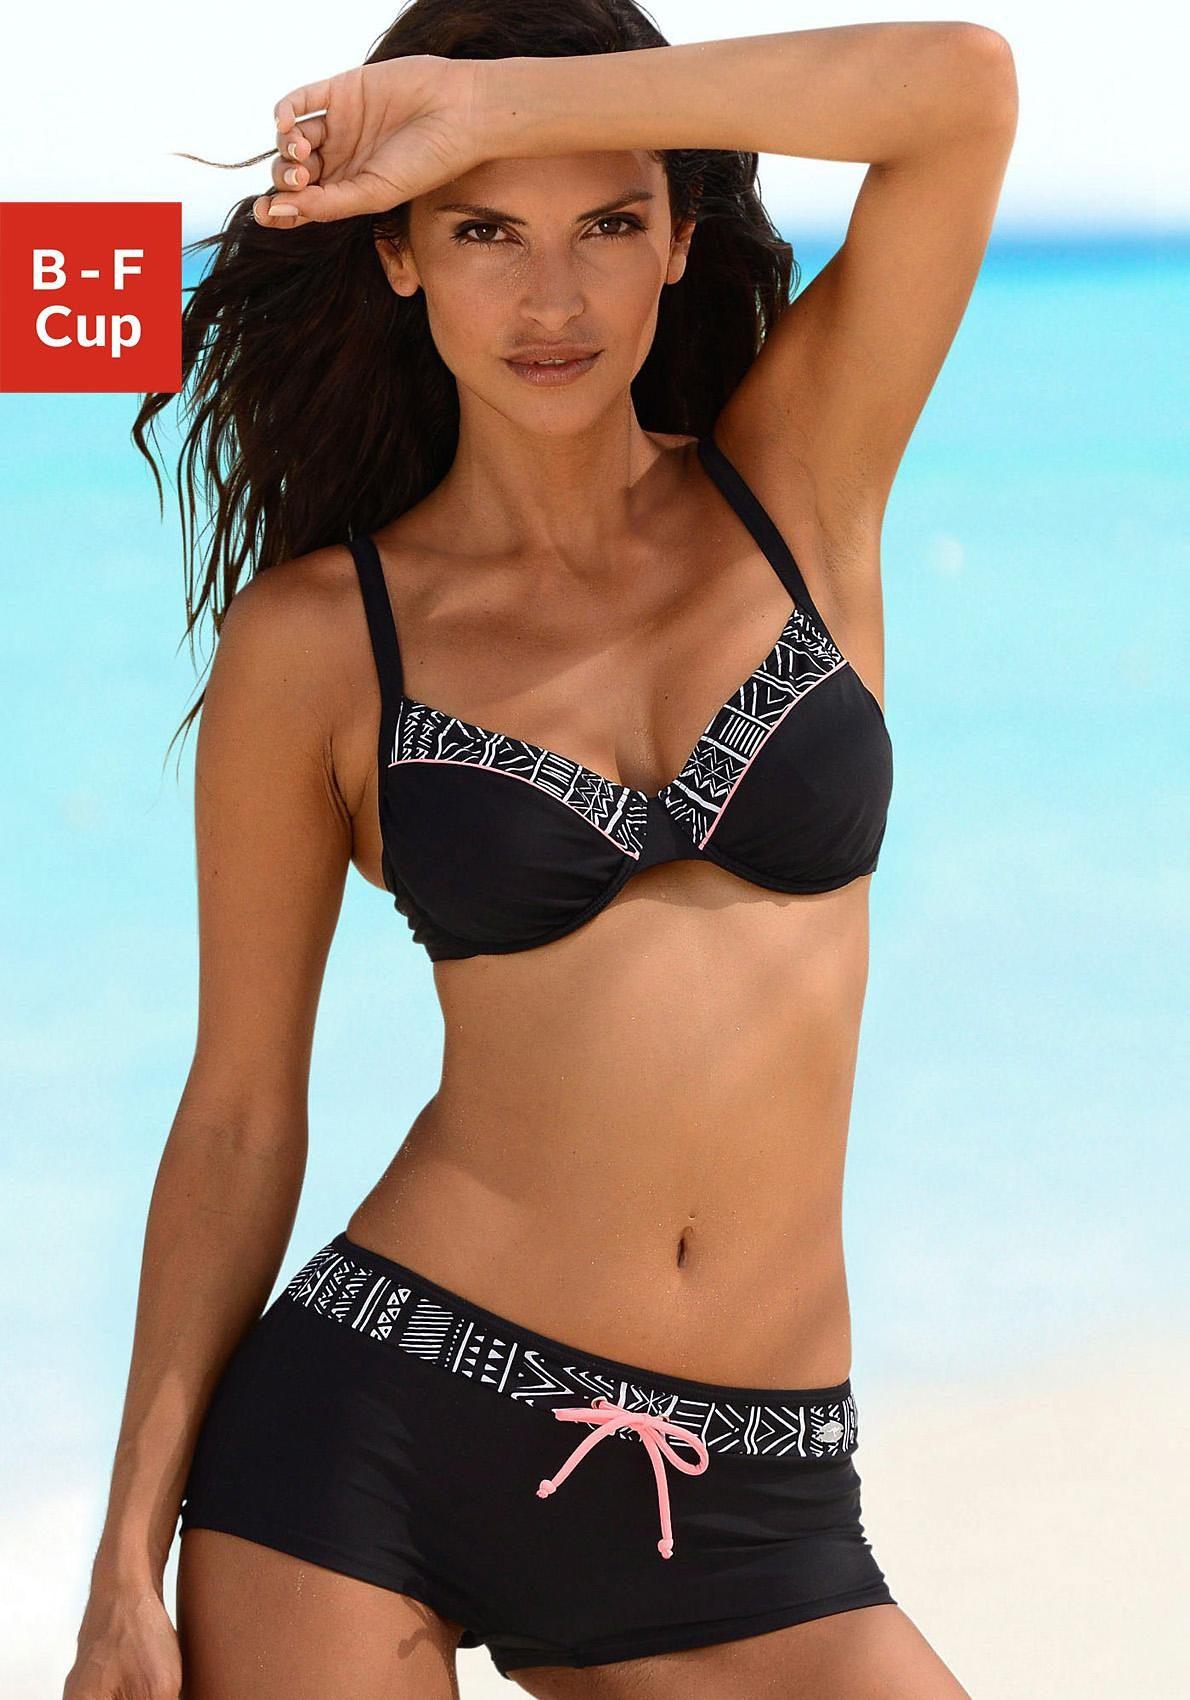 KangaROOS Bügel-Bikini mit Hotpants